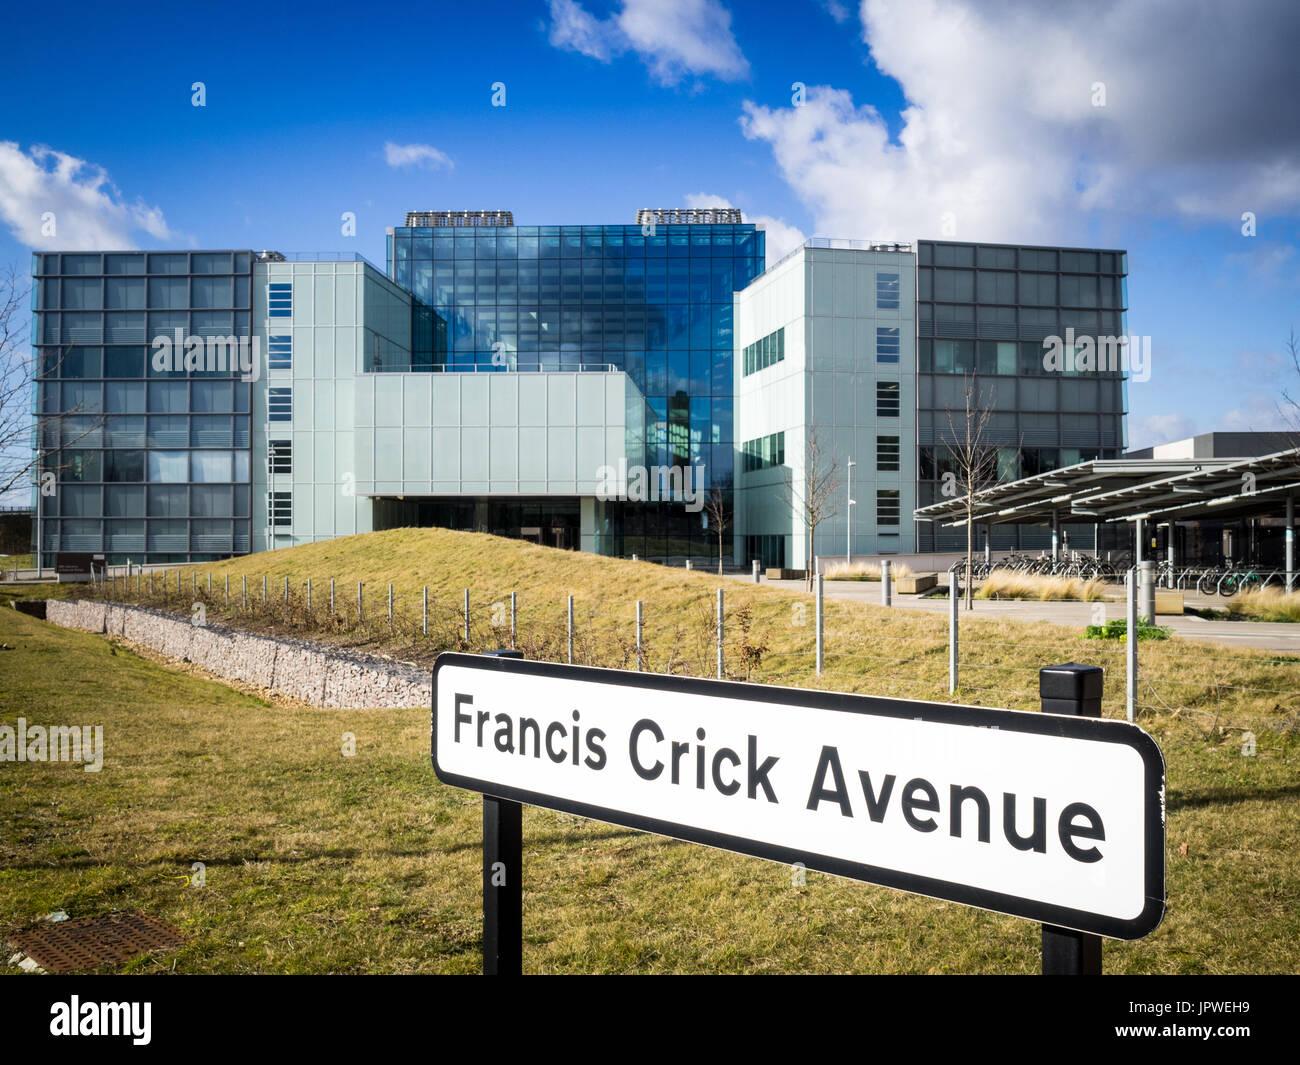 Università Campus - la MRC Laboratory of Molecular Biology, à Francis Crick Avenue, Cambridge UK. Photo Stock